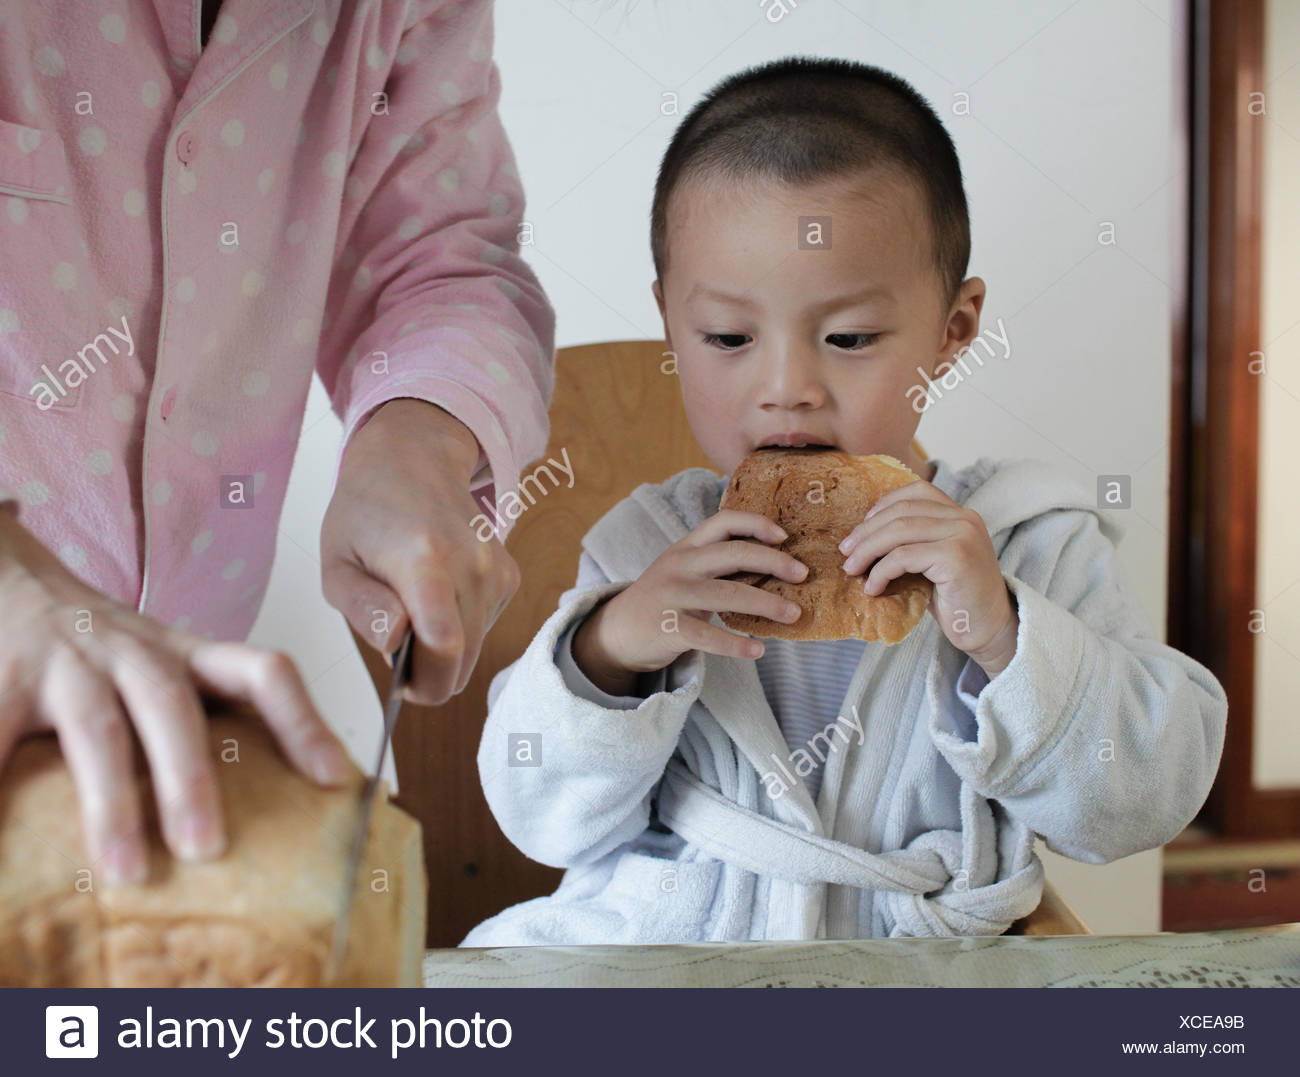 Boy (2-3) eating breakfast - Stock Image